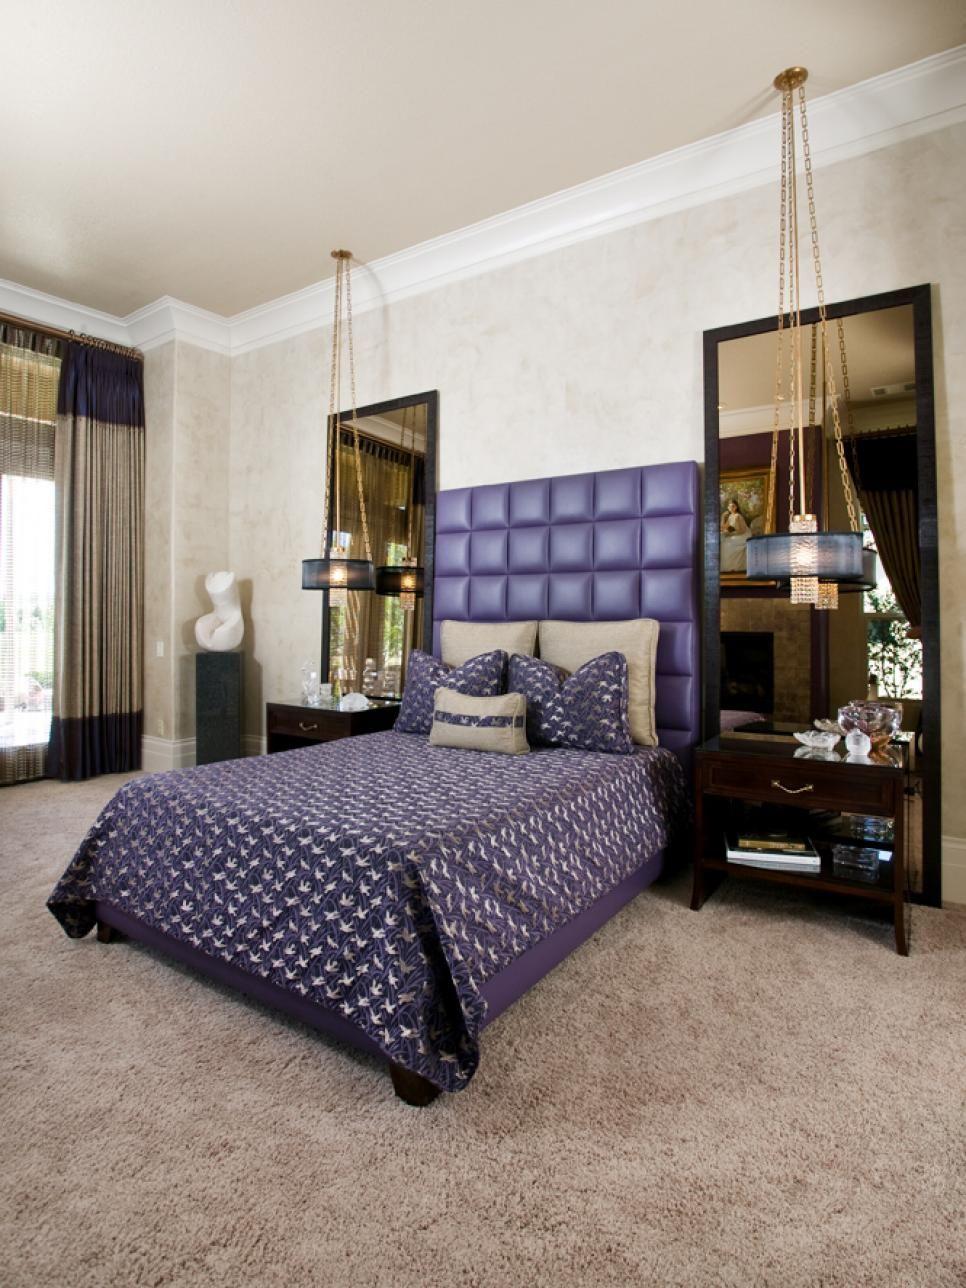 Bedroom Lighting Ideas Bedroom Retreat Purple Headboard